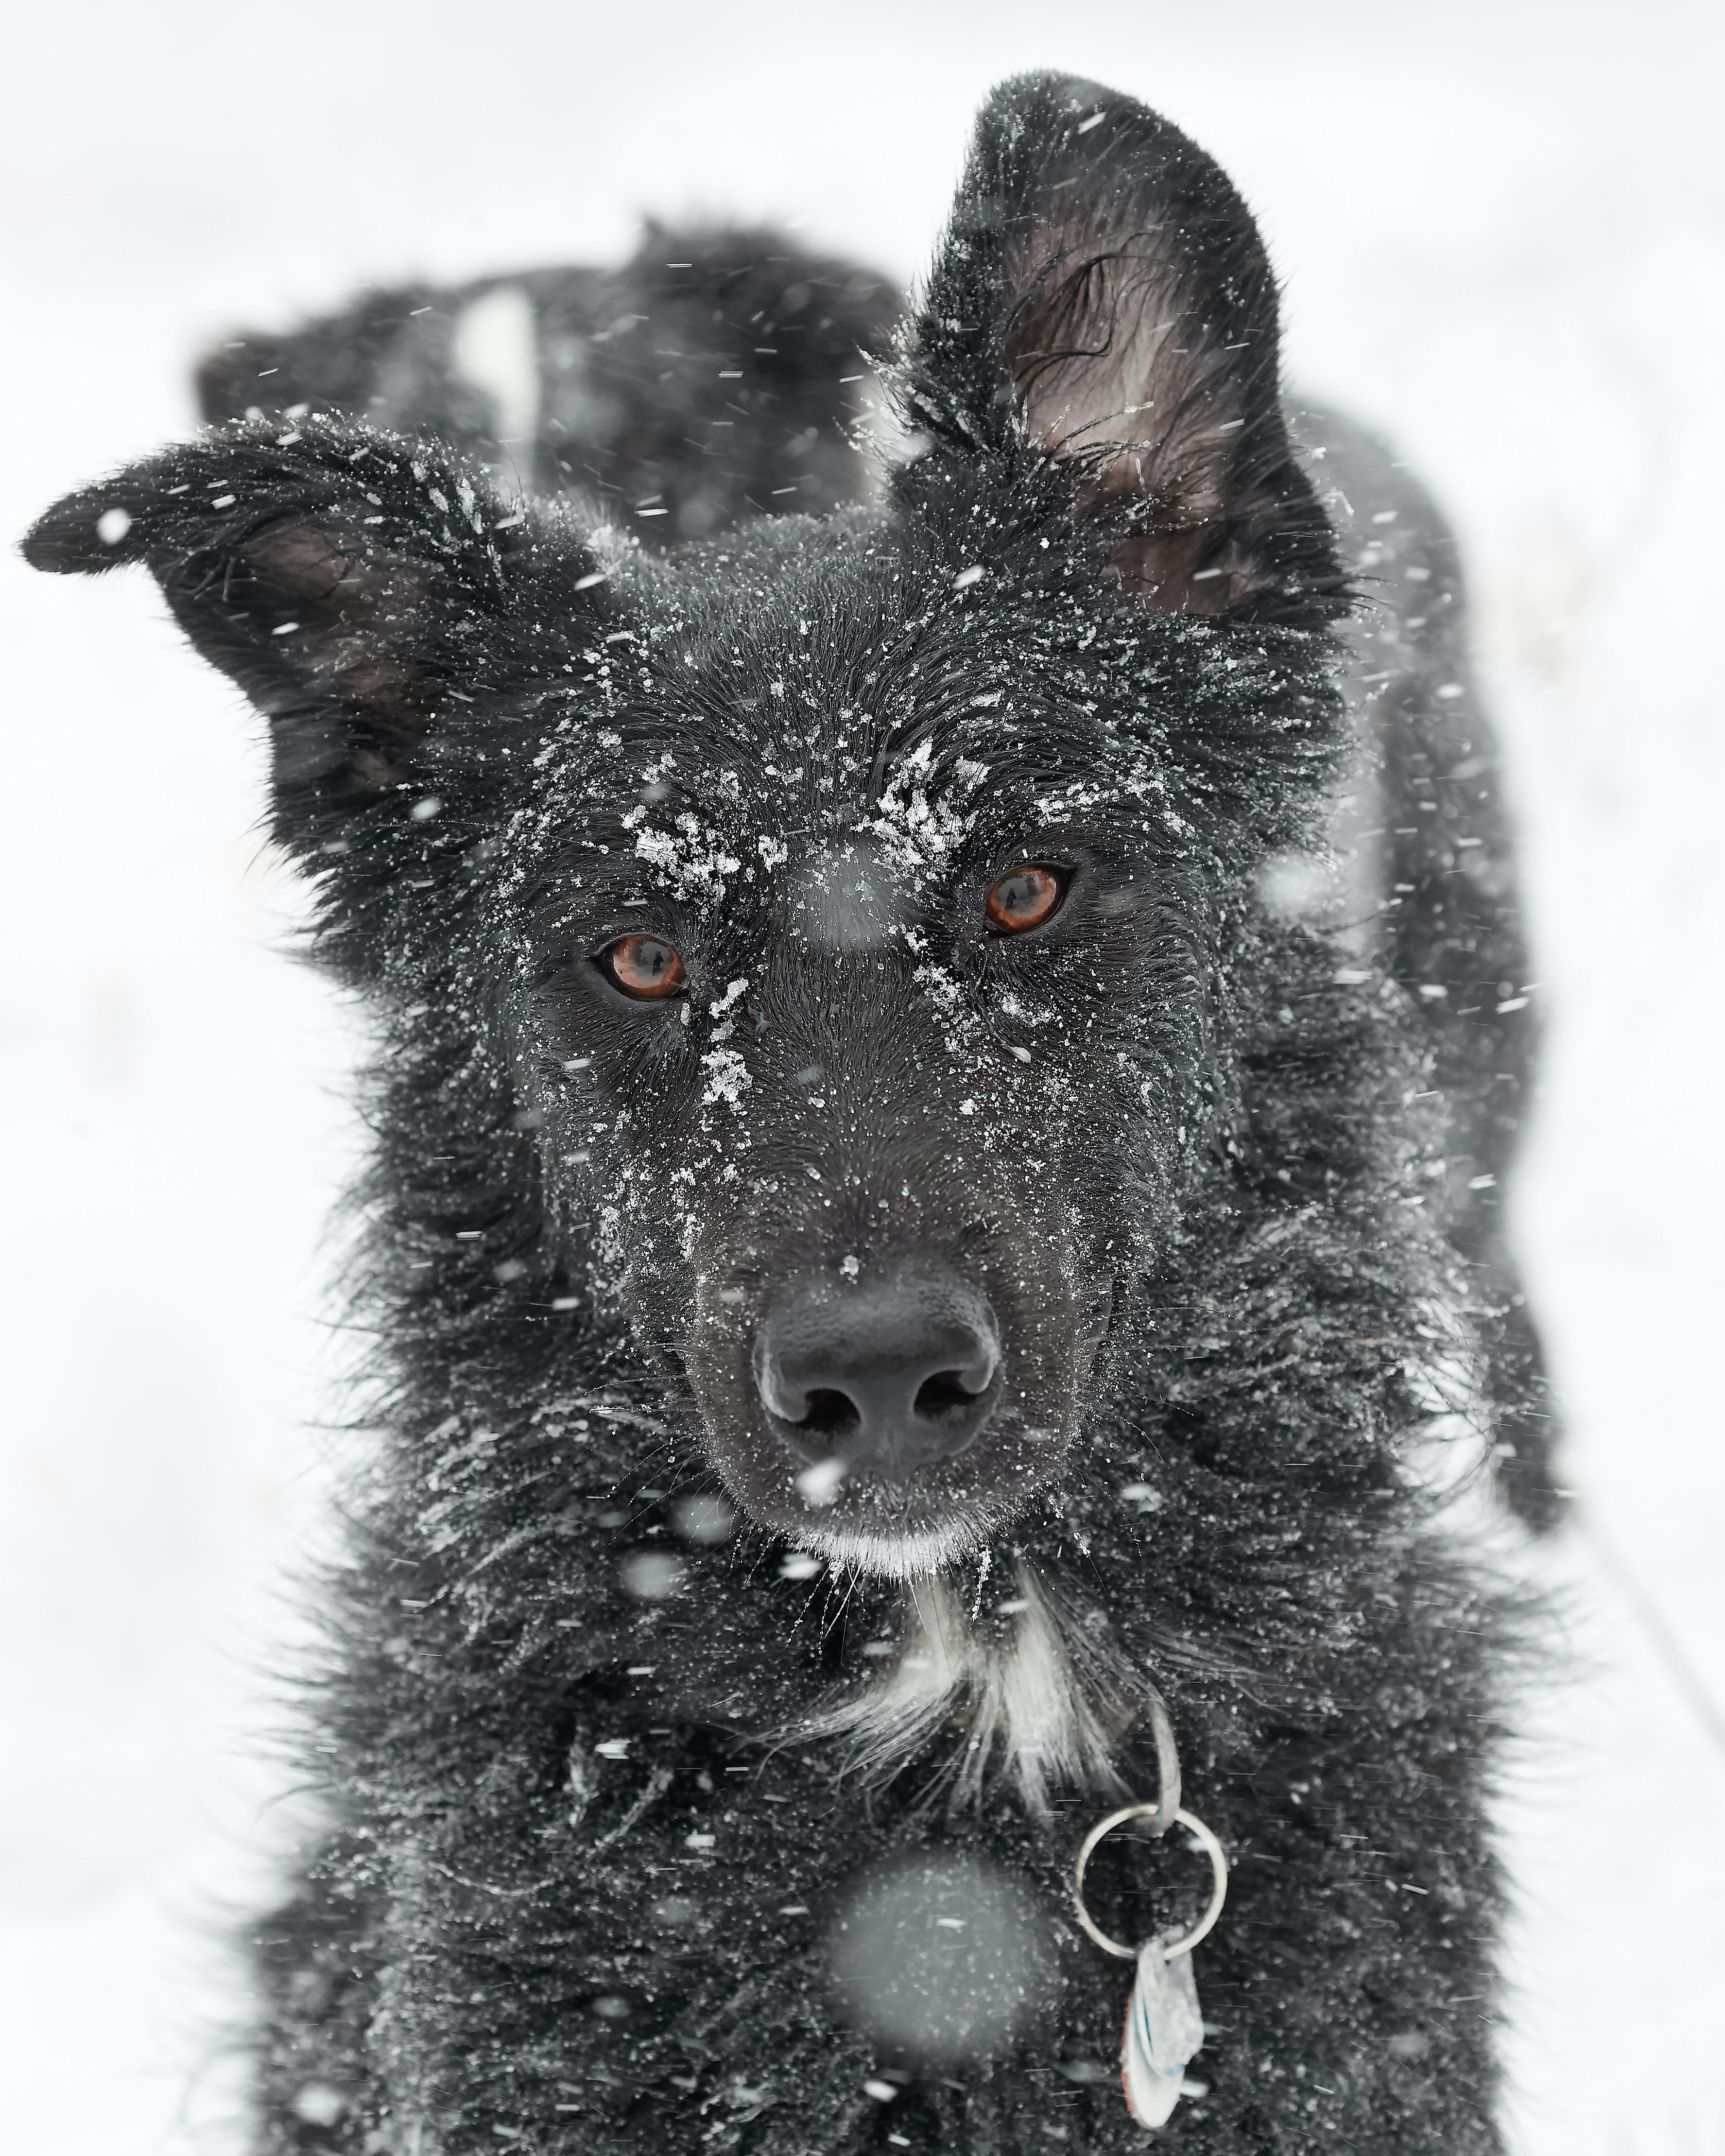 black dog in snow terrain during daytime